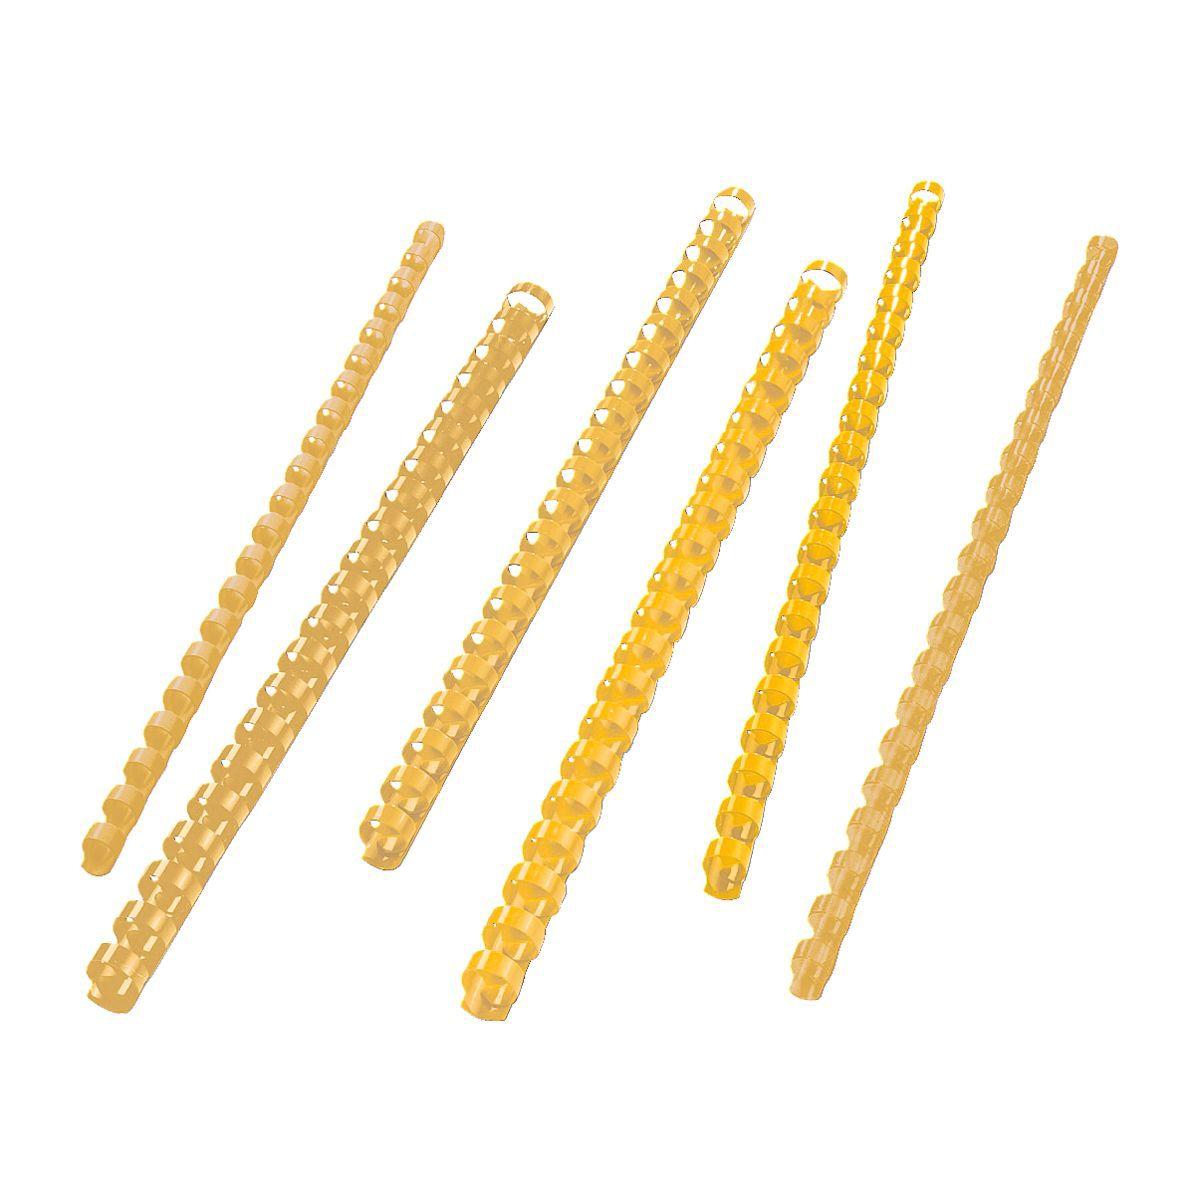 OTTO Office Standard Plastikbinderücken